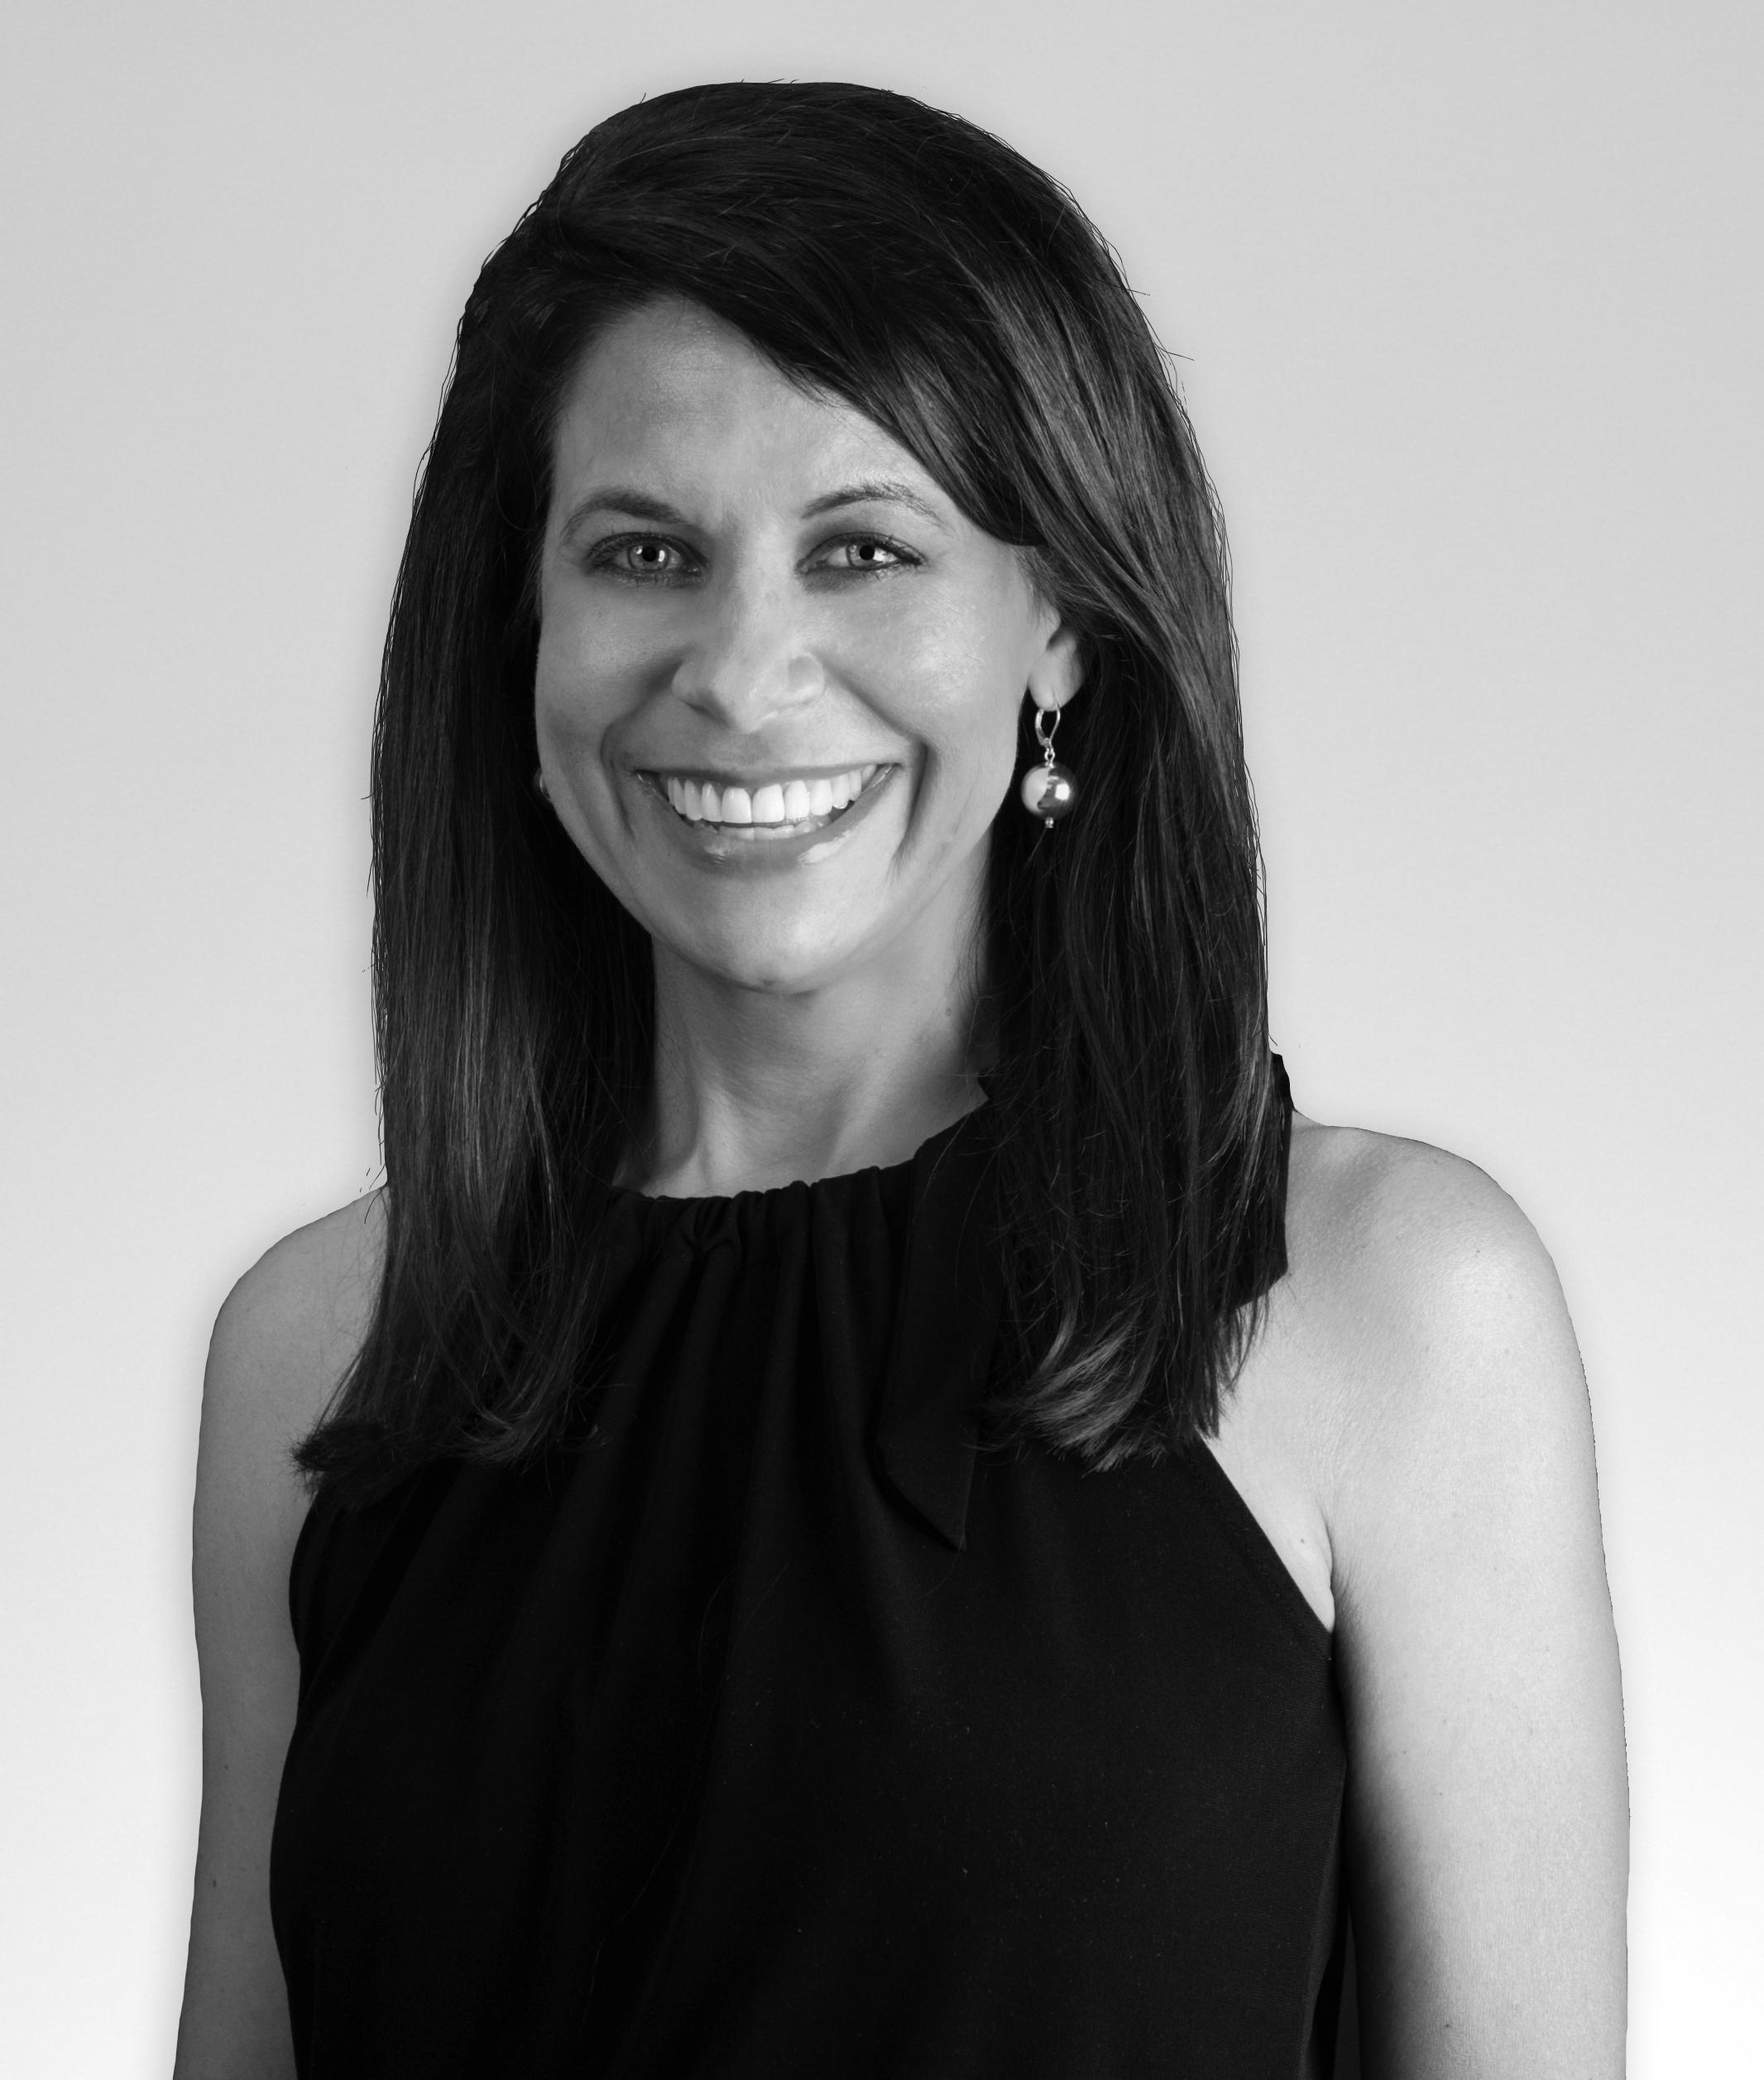 Melissa Marchwick